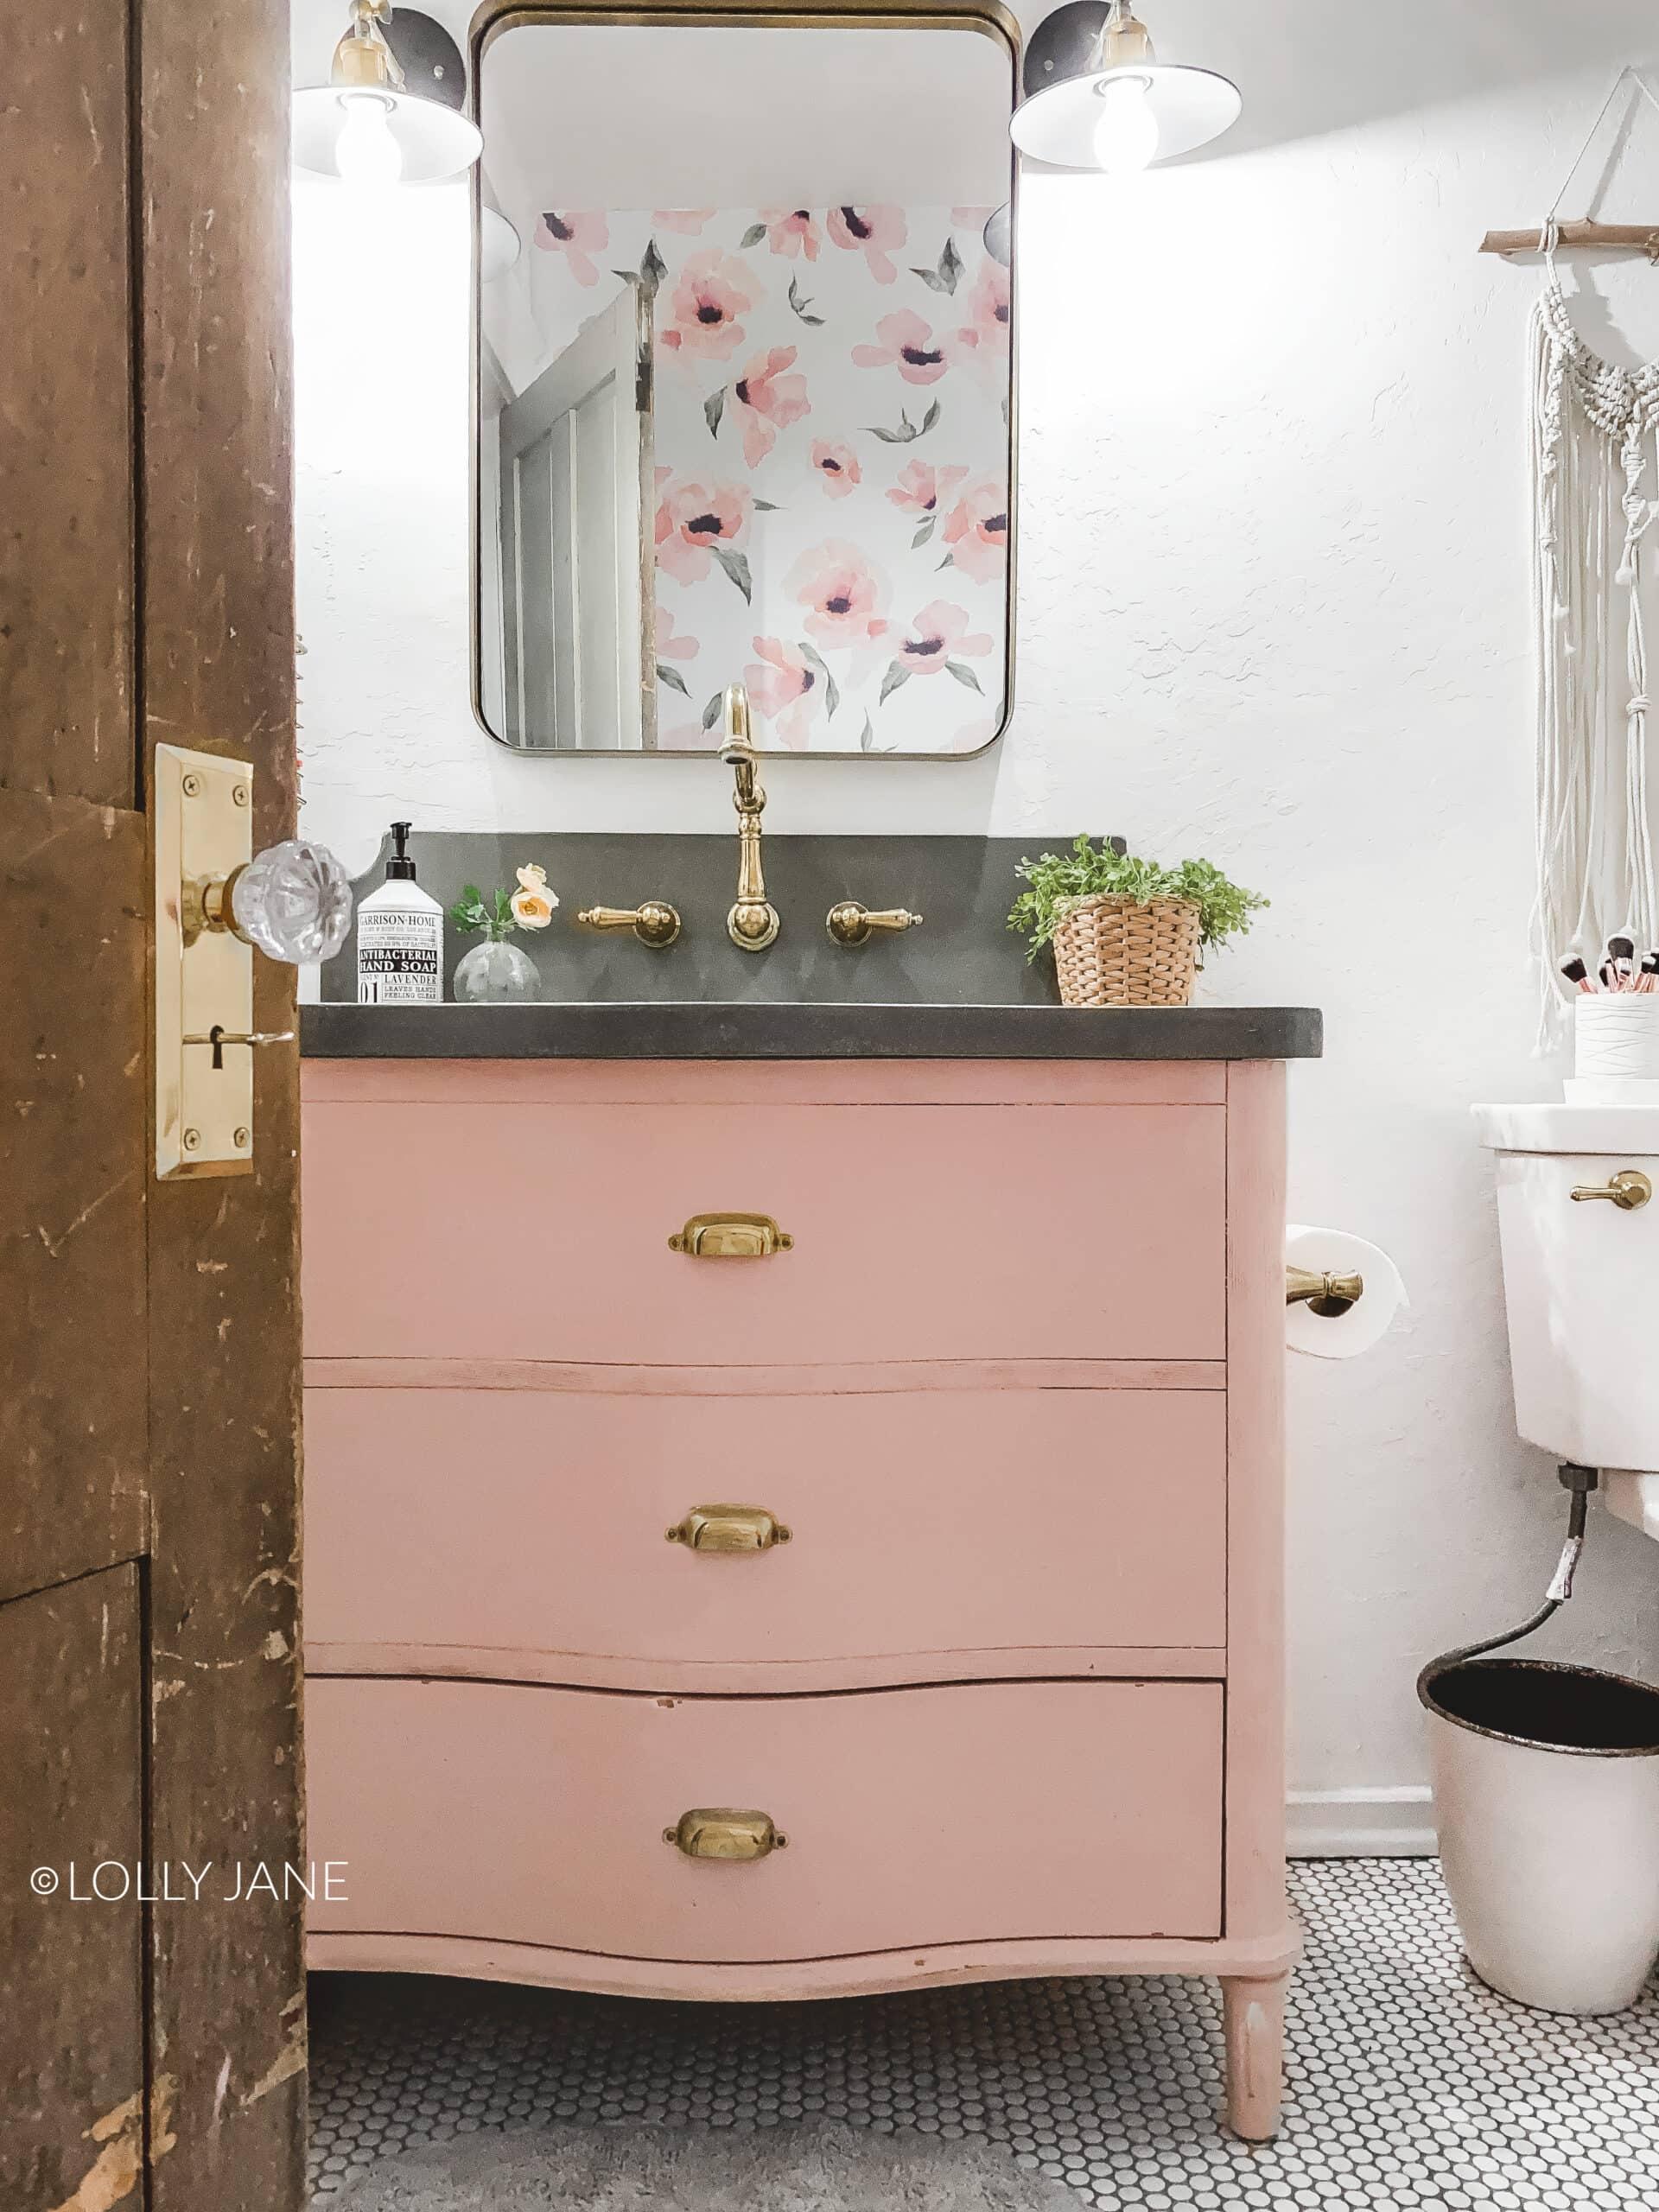 DIY Pink Vanity Makeover, so cute in this modern farmhouse bathroom remodel!